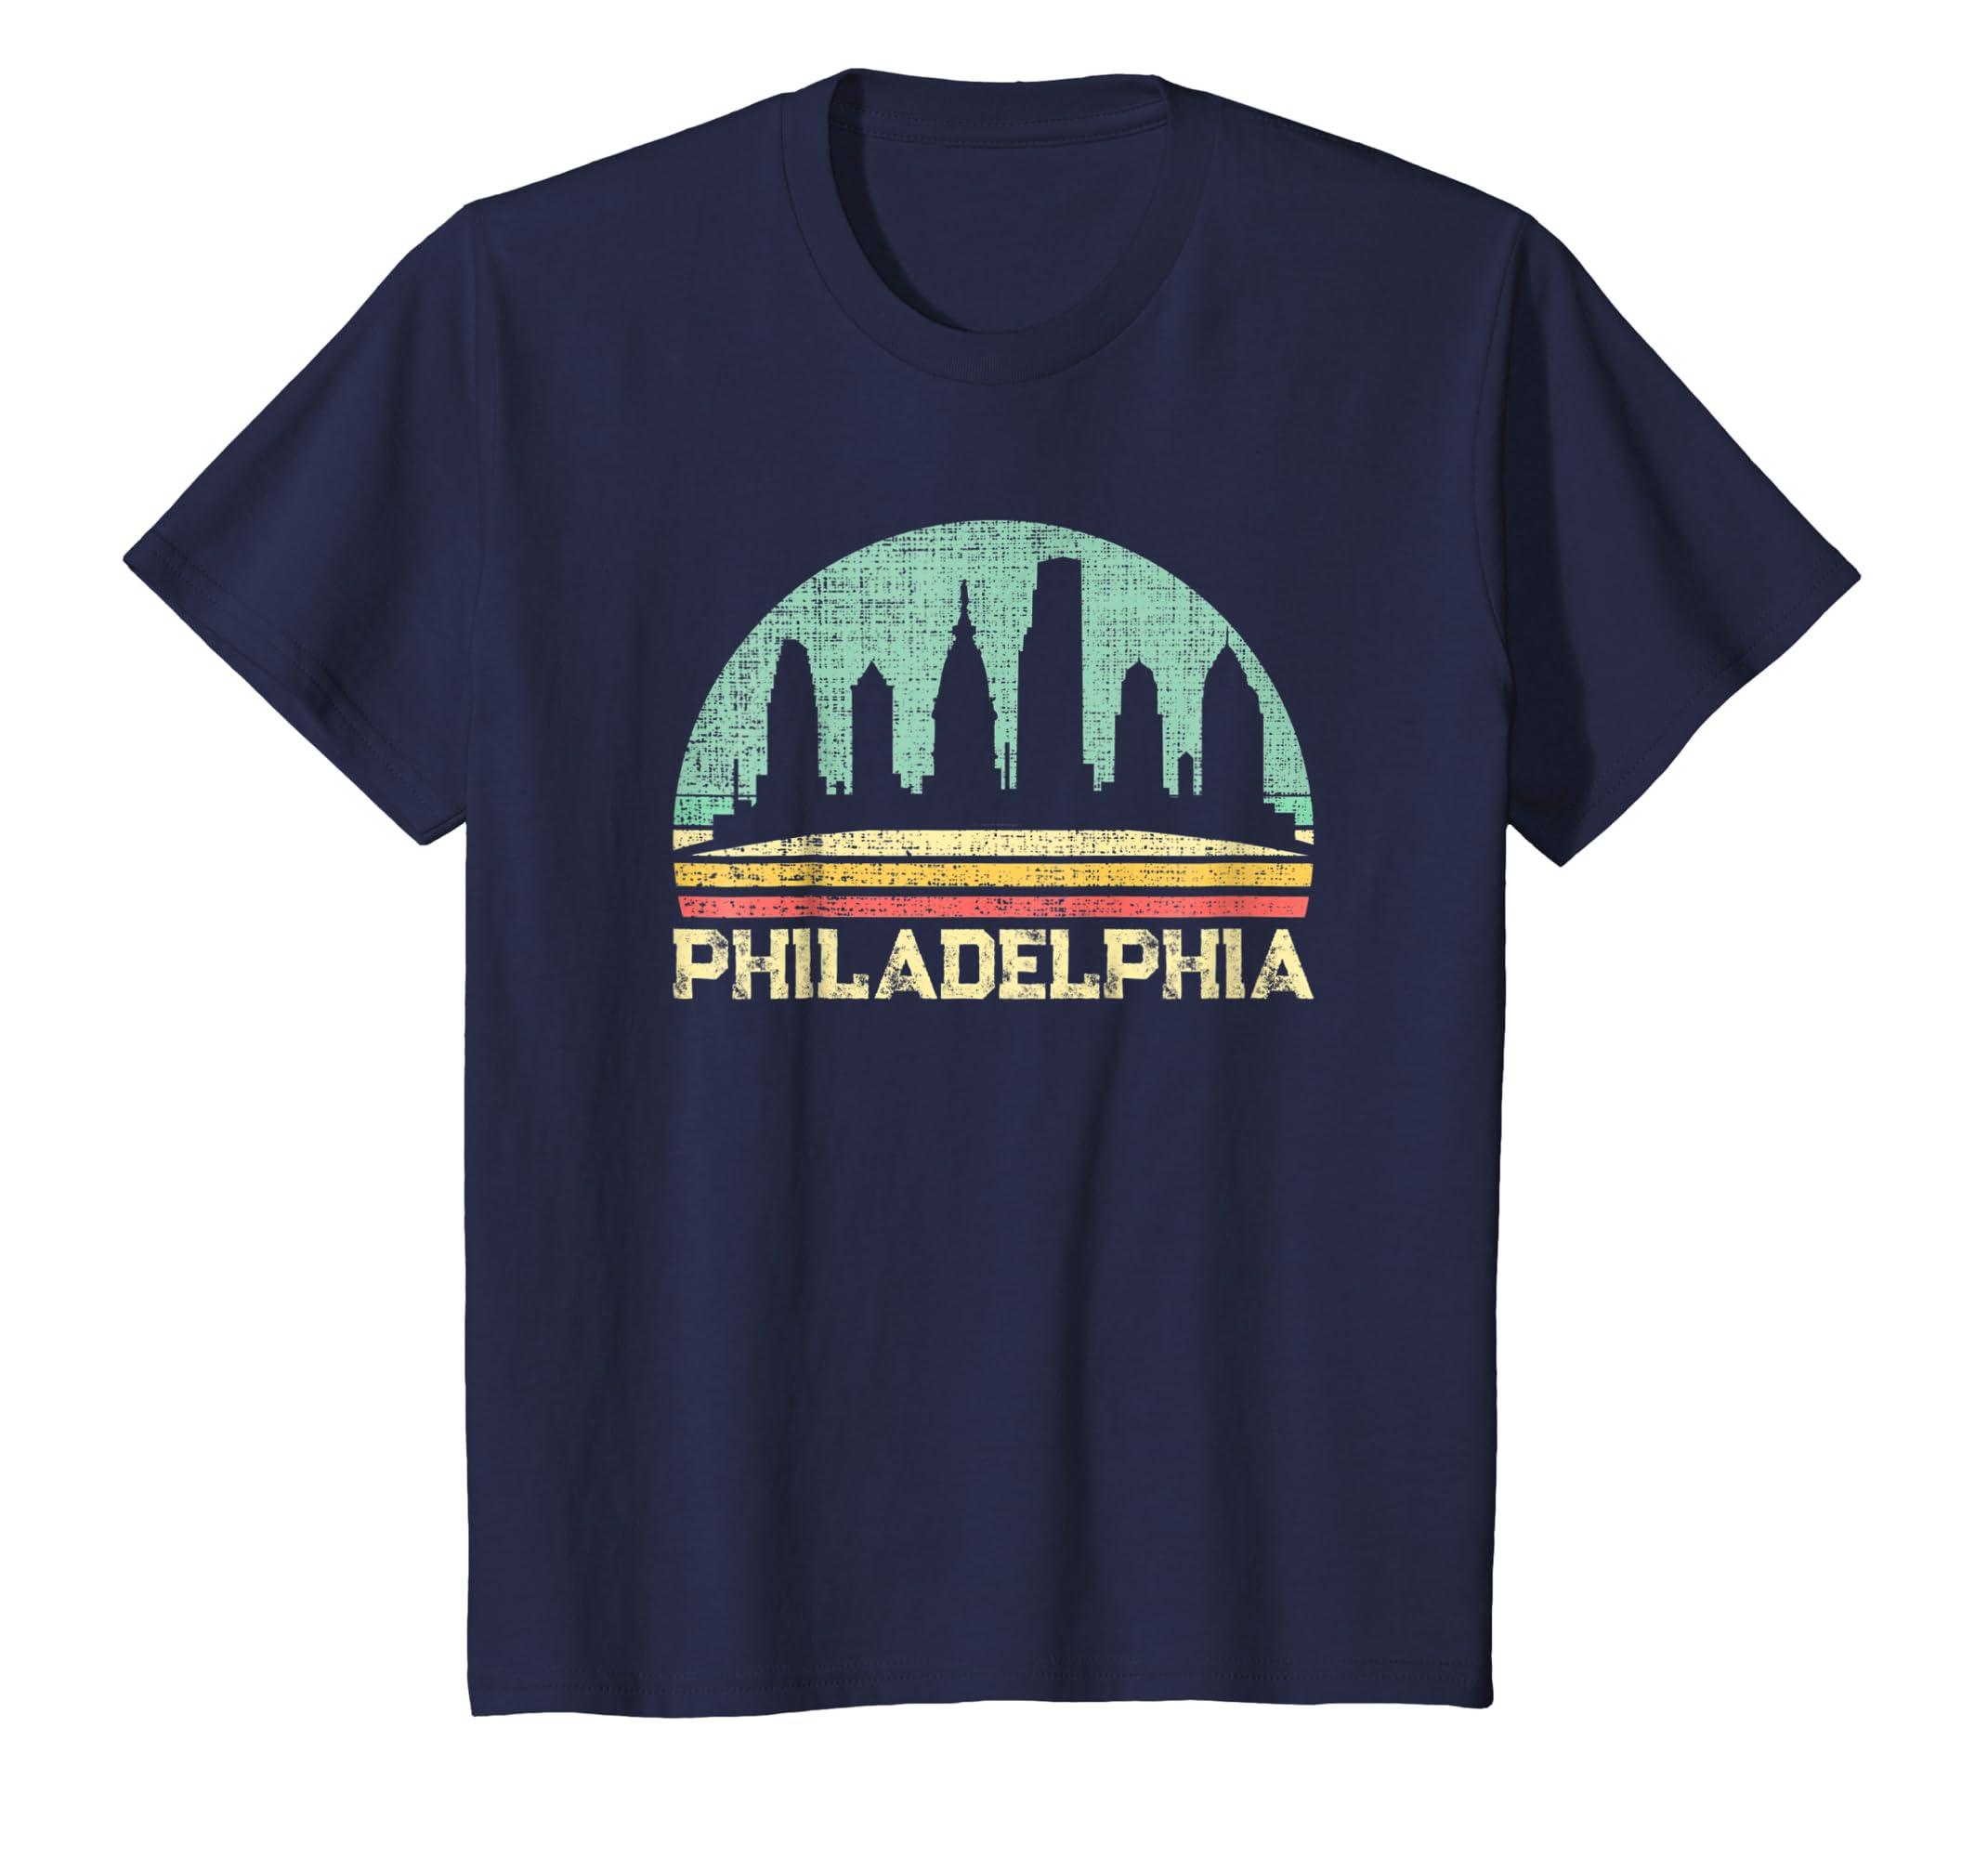 Classic Retro Vintage Philadelphia City Pennsylvania Tshirt-Teechatpro